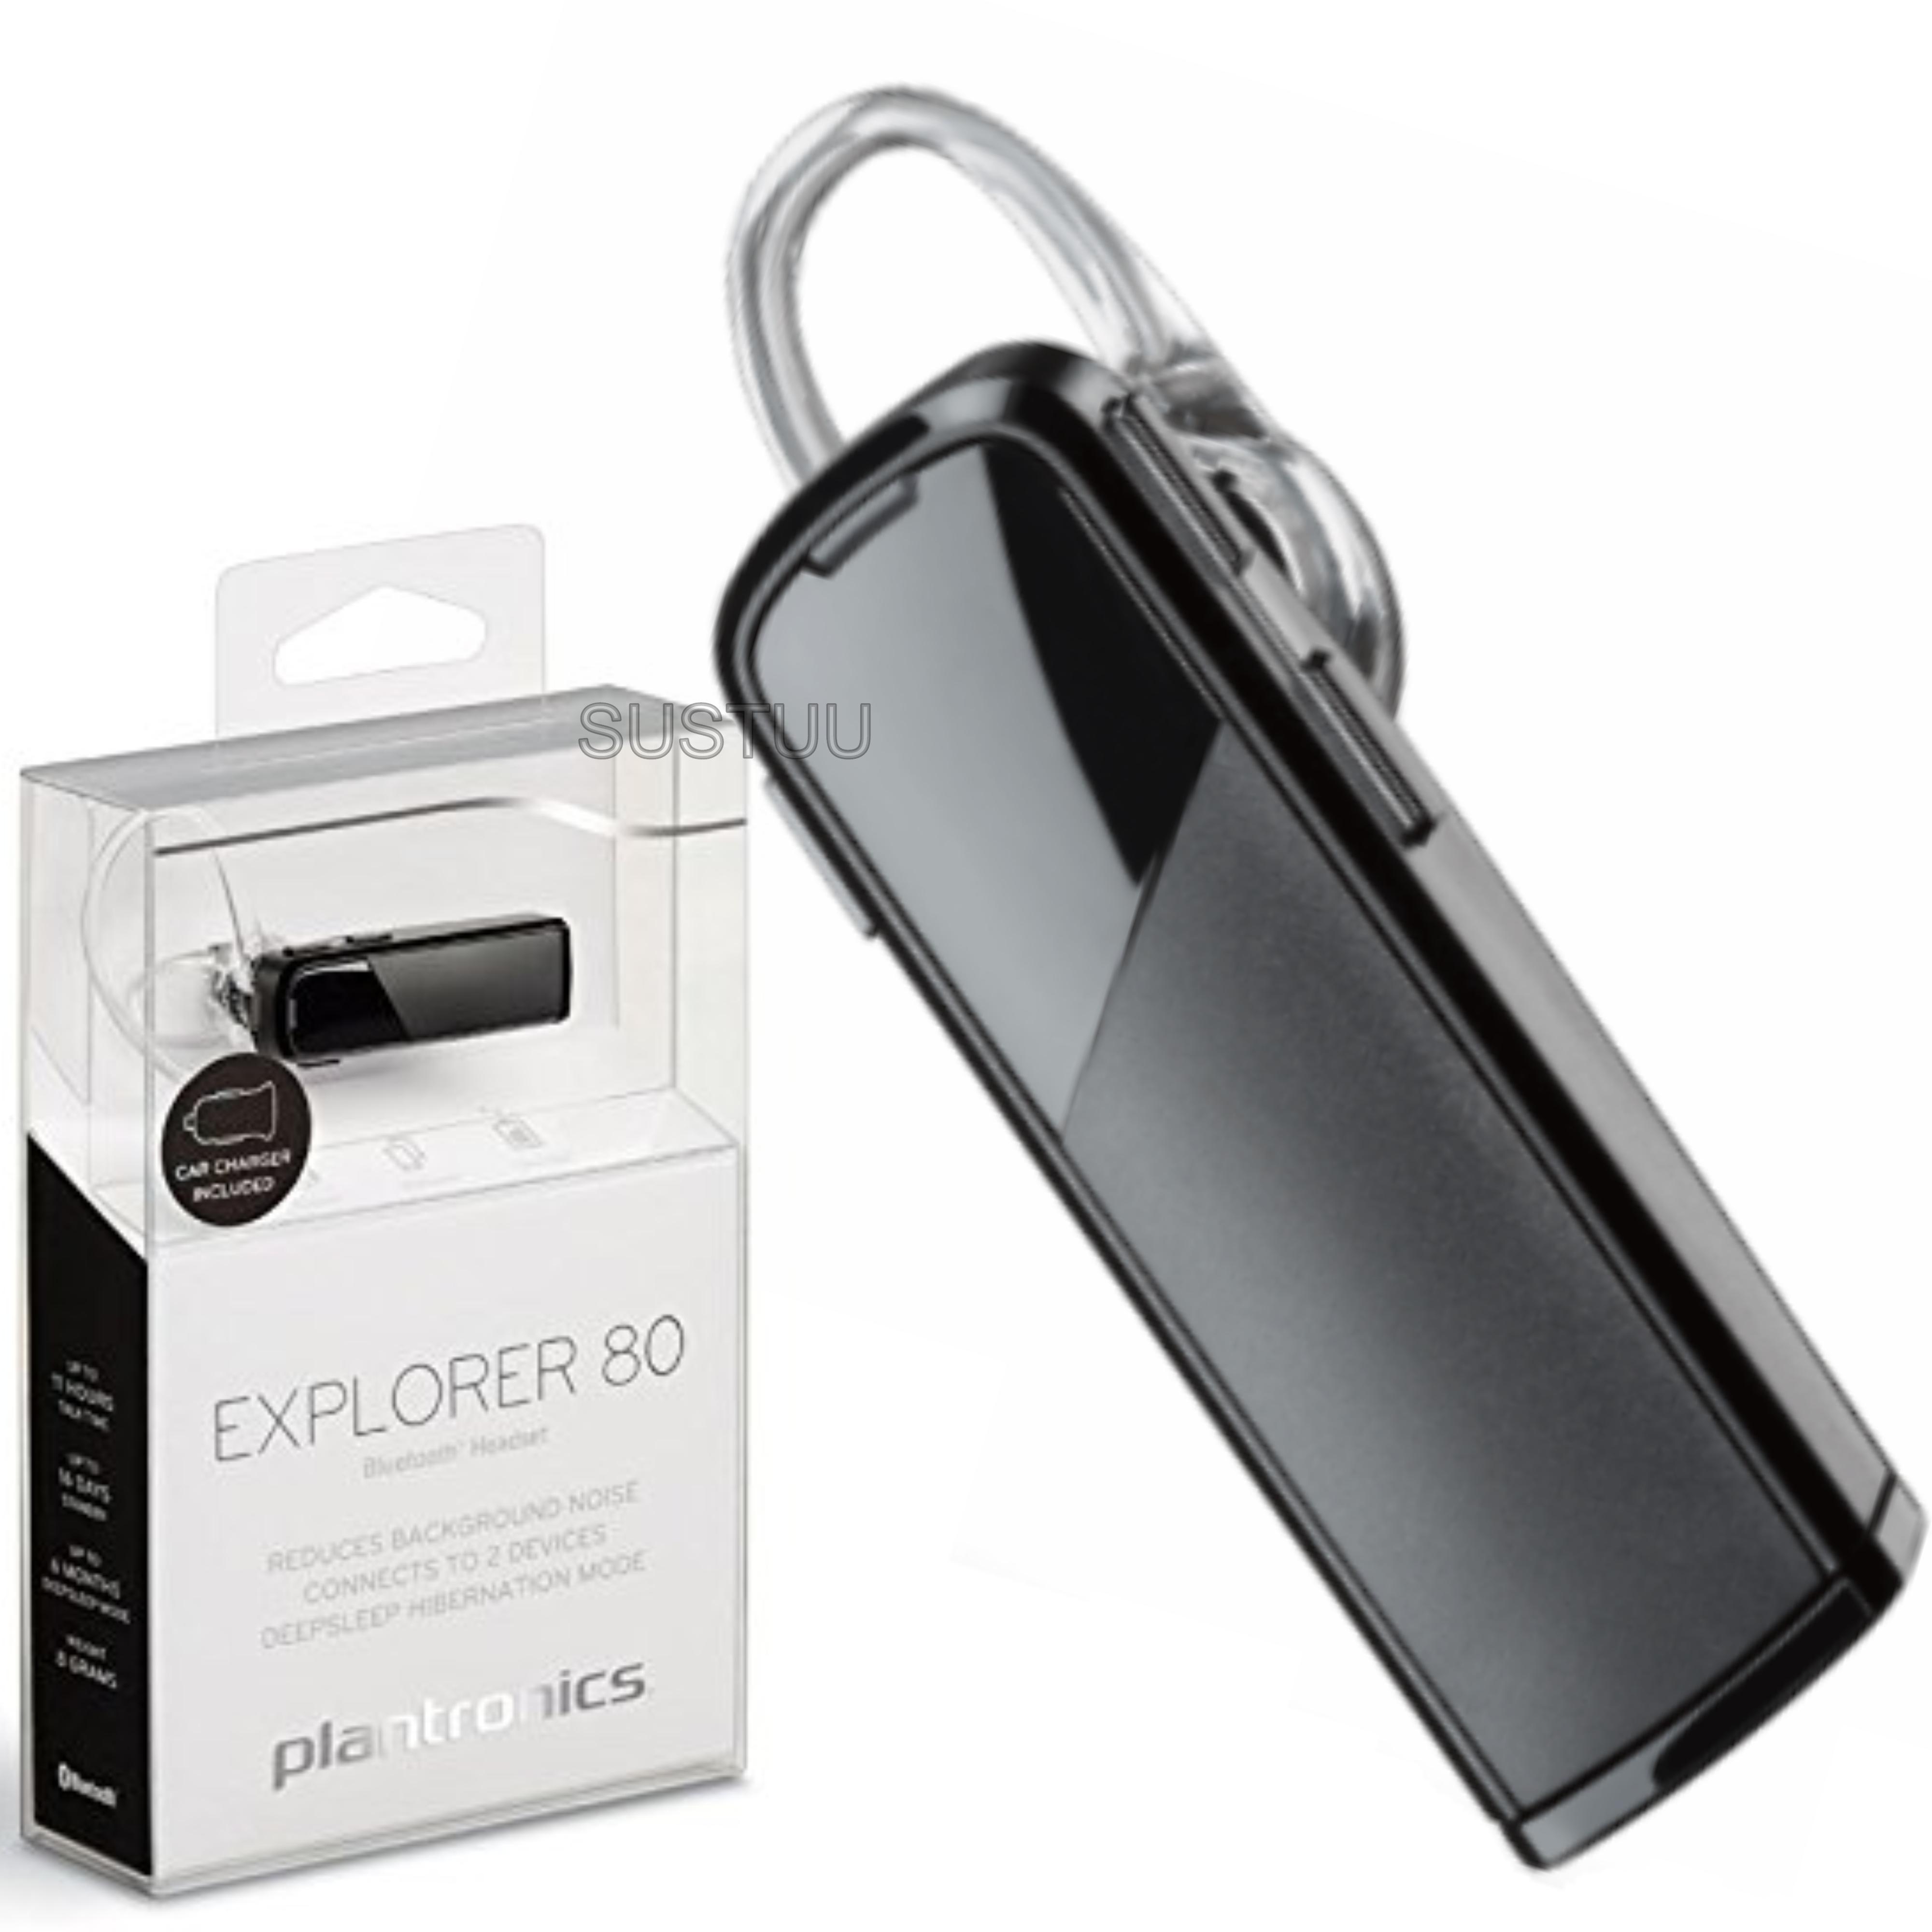 fbe6f111195 Plantronics Explorer 80 Wireless Bluetooth Headset | Mobile Phone  Hands-free Calls | Sustuu